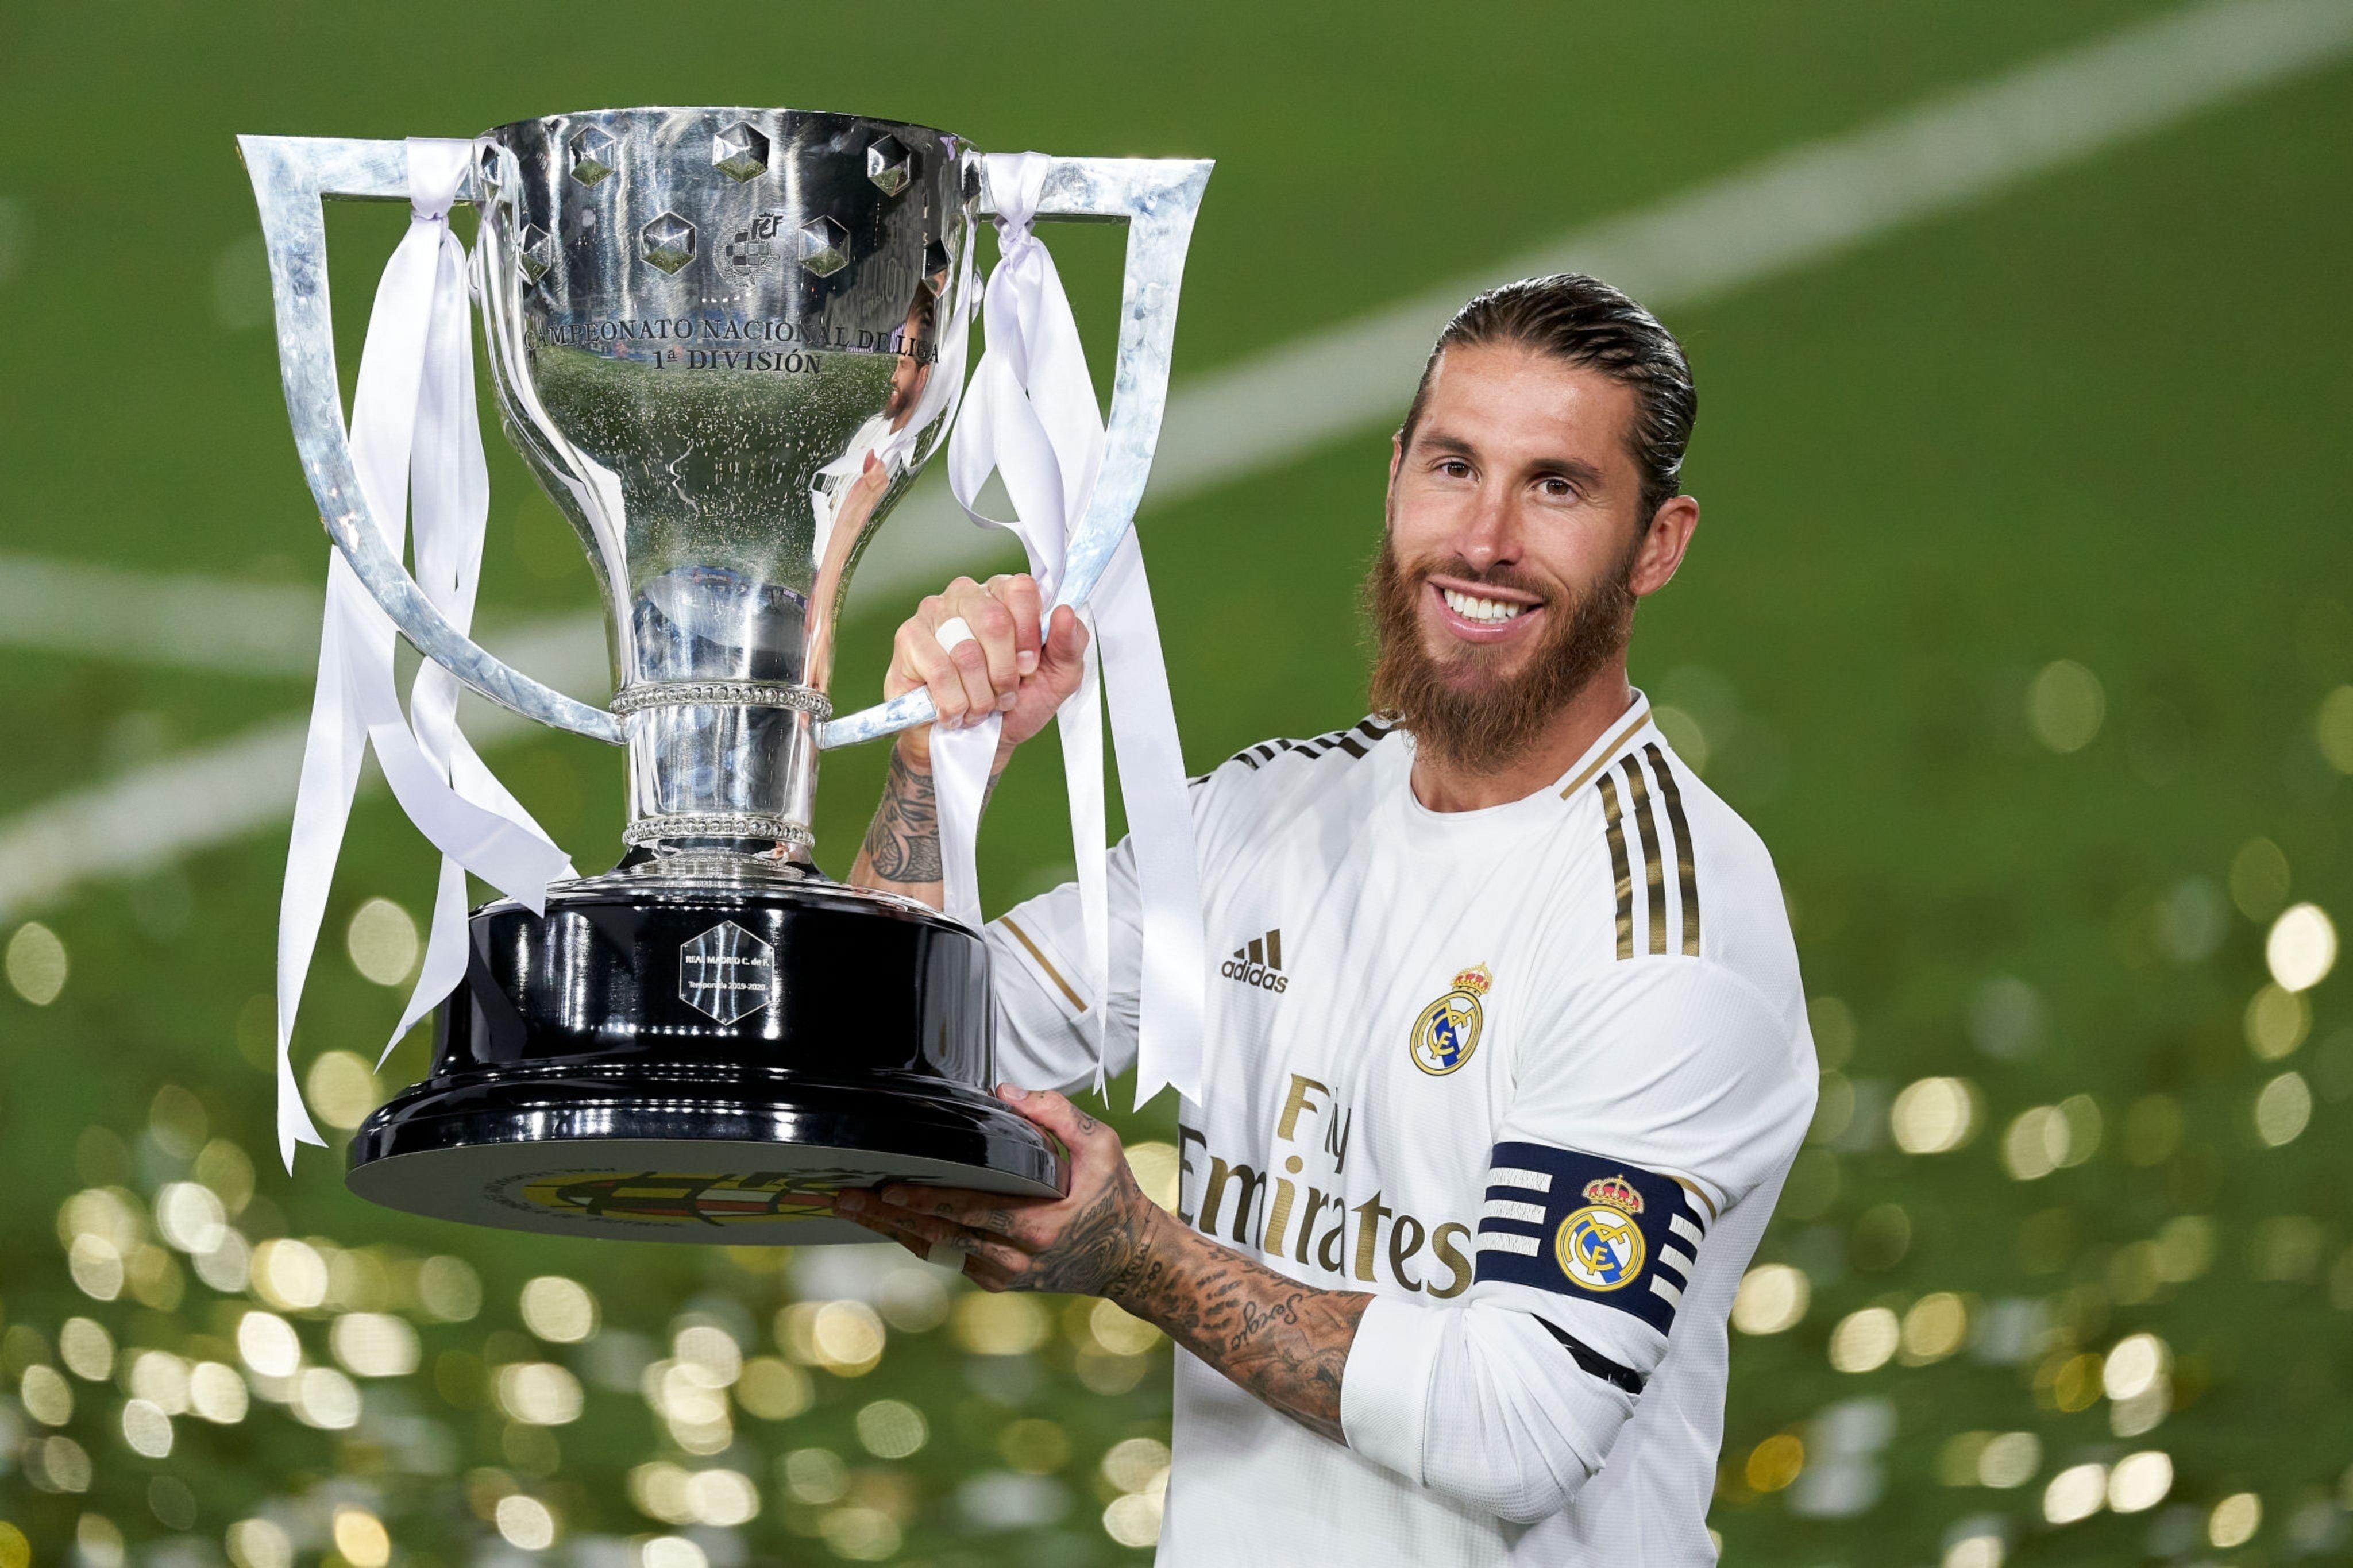 La Liga 2020/21. Who has the best opportunity to catch the glory? - Football Espana